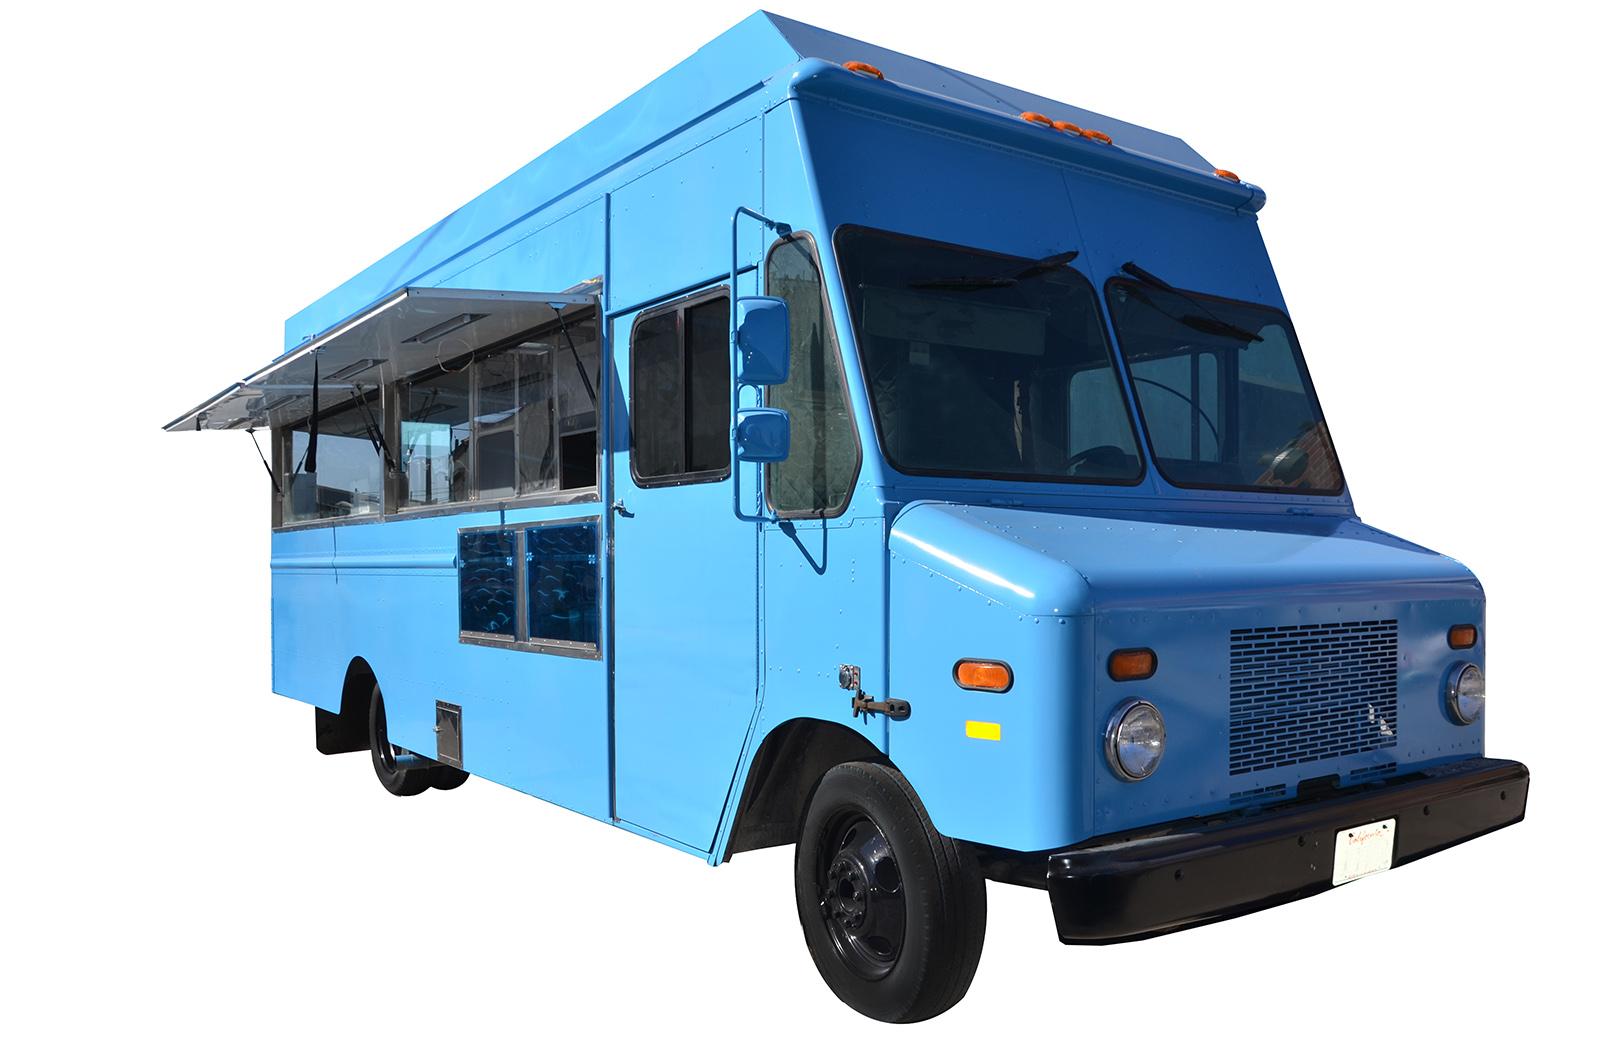 Hot Dog Cart Kiosk On Wheels Food Carts Mobile - Buy Hot ...  |Asian Food Carts Wheels